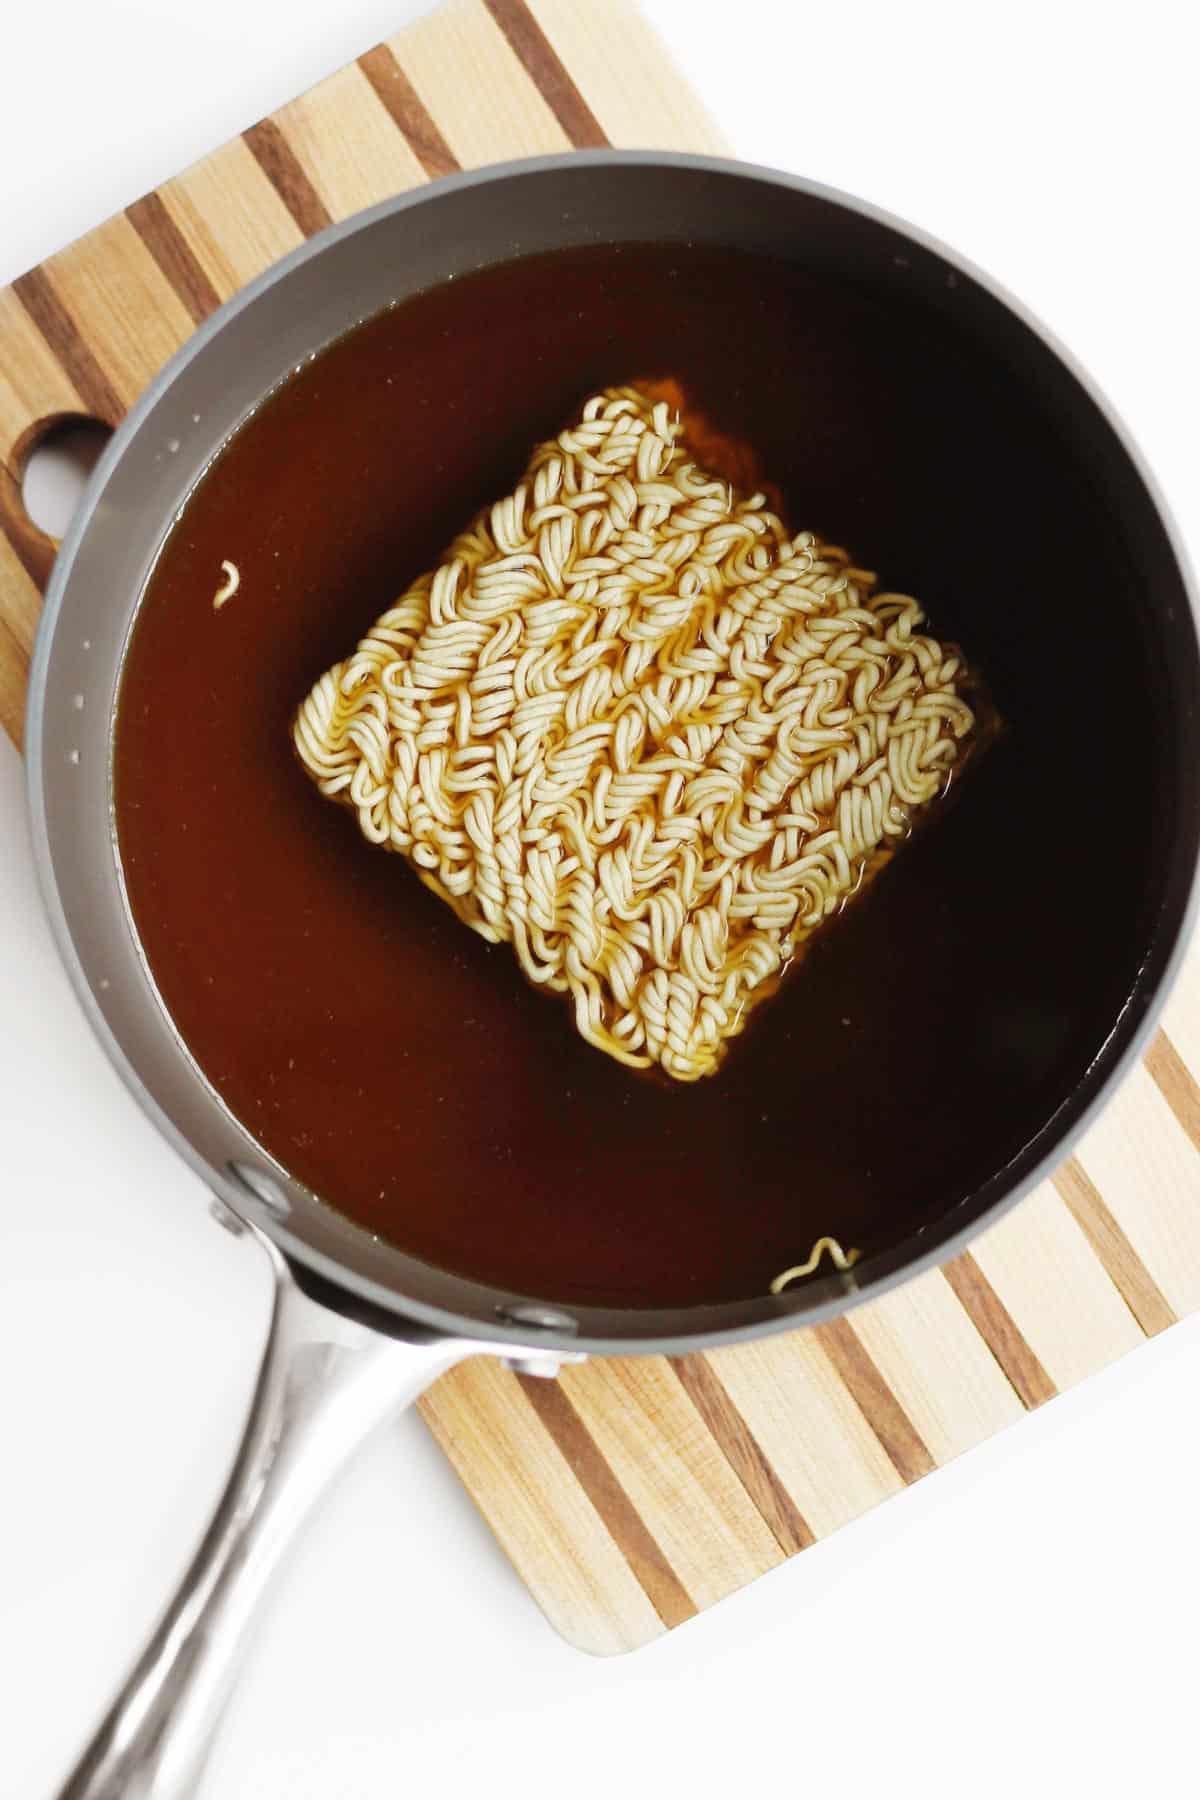 Homemade Top Ramen recipe